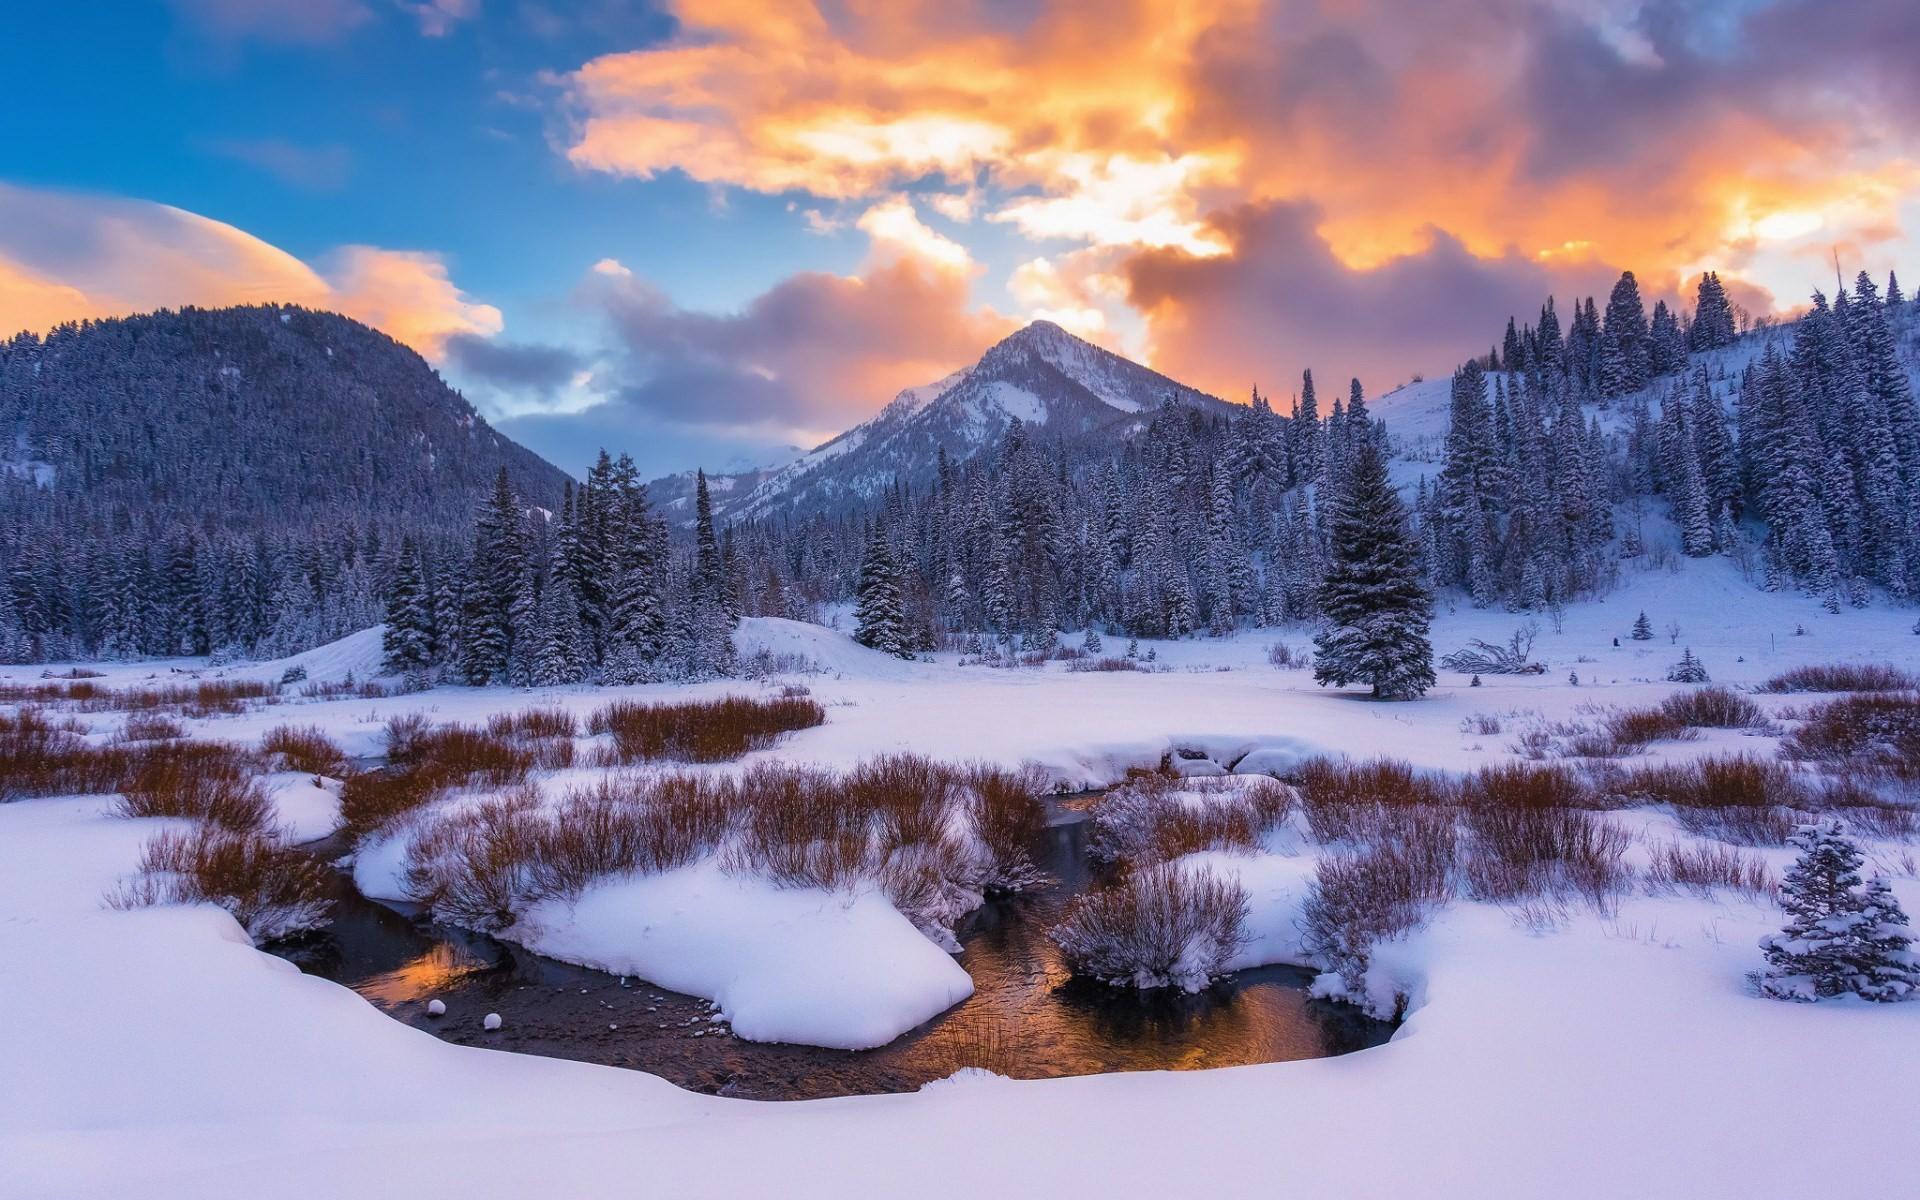 2017-03-22 – Desktop Backgrounds – winter backround – #1656202